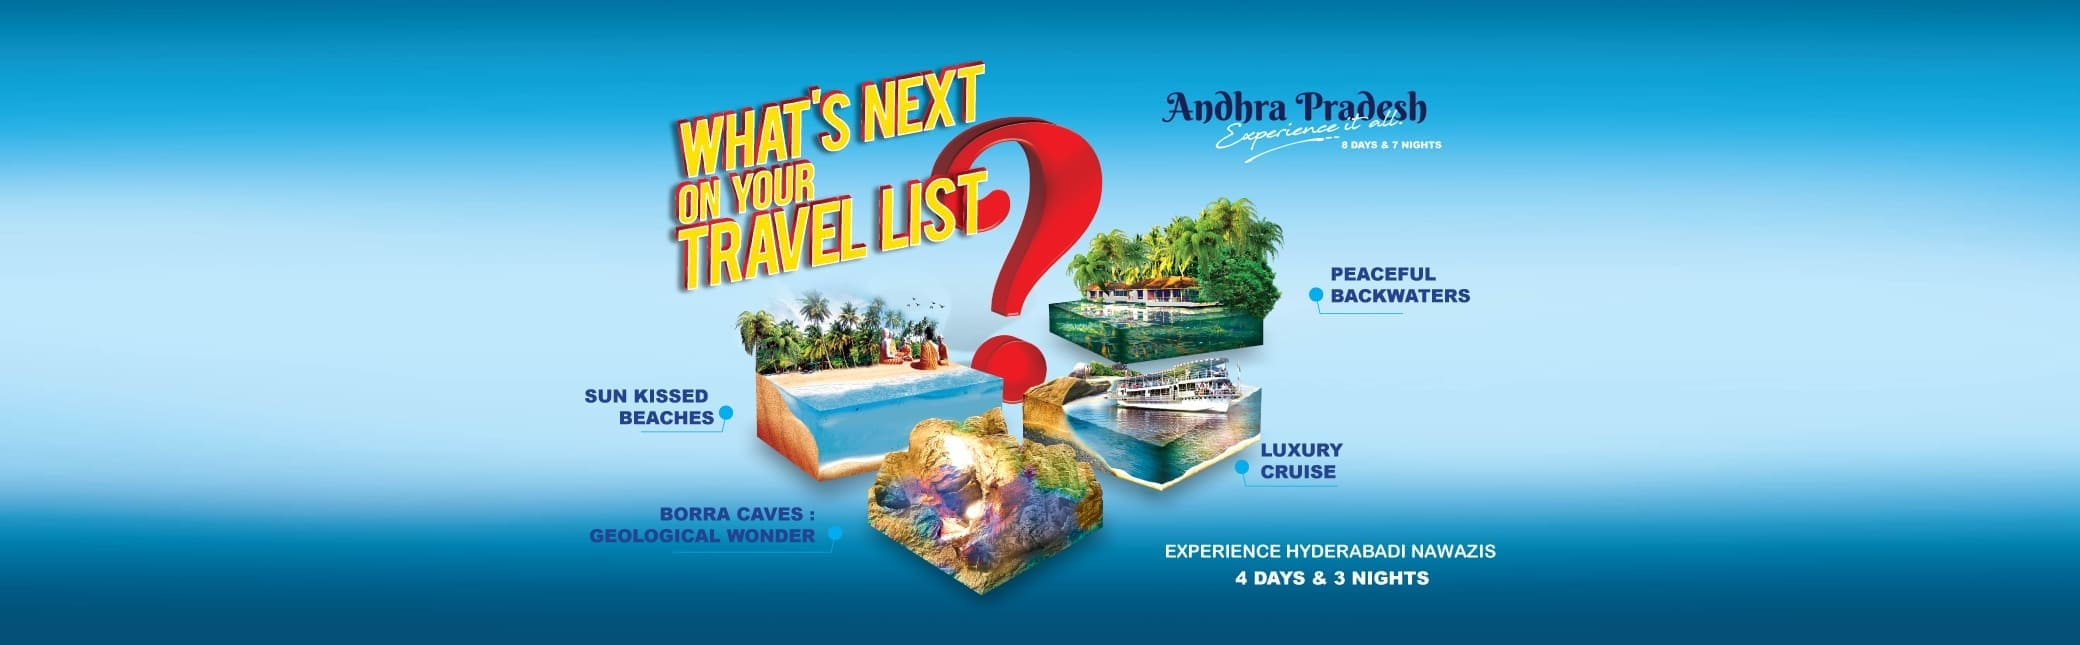 Andhra Pradesh Tour Package